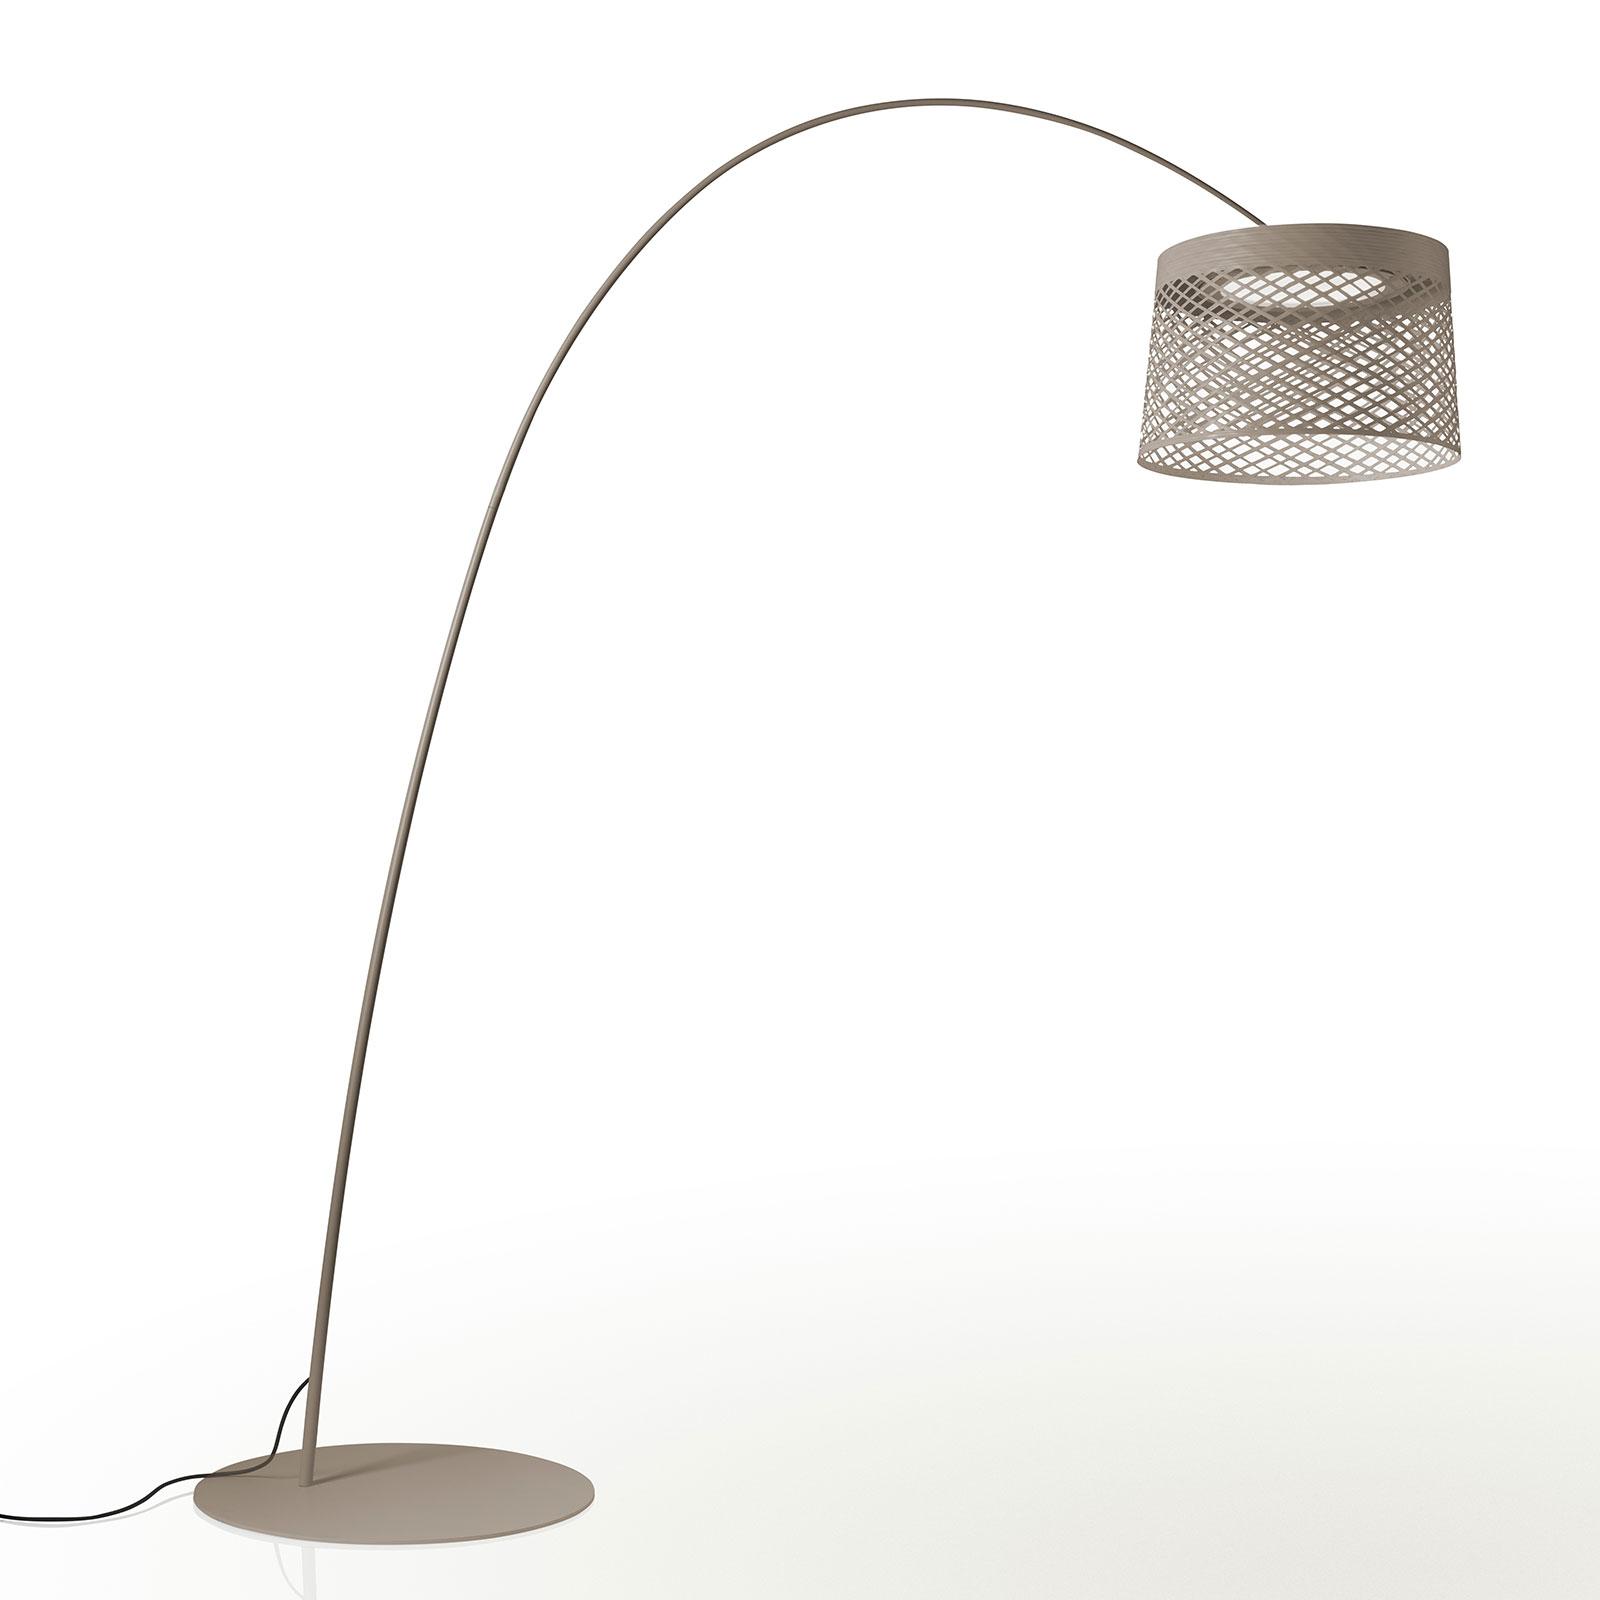 Foscarini Twiggy LED -kaarivalaisin, greige